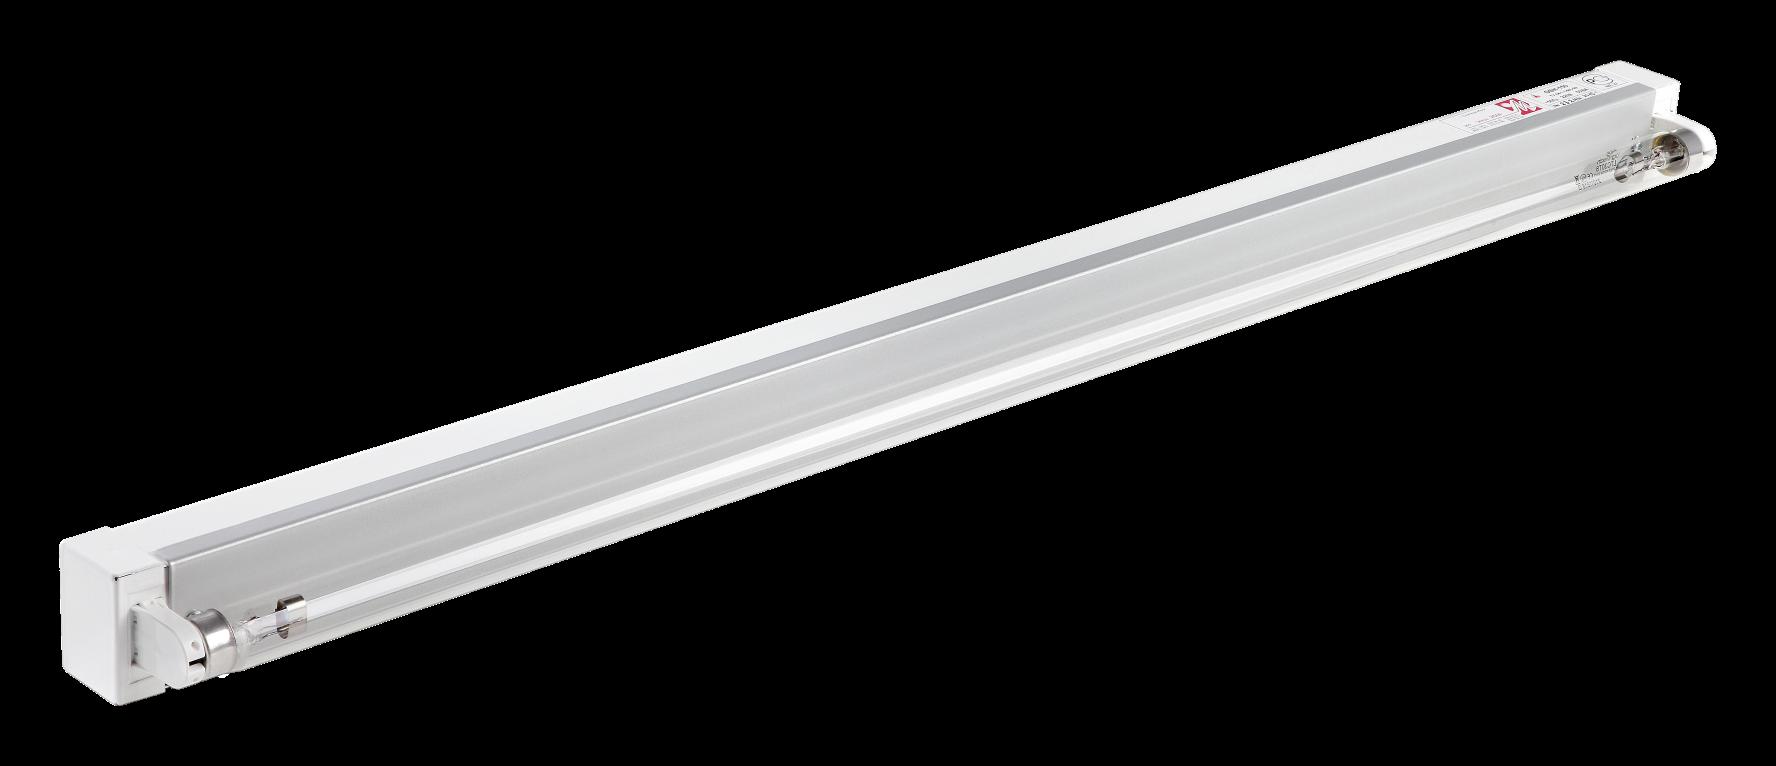 ОБН 150 открытого типа бактерицидный облучатель